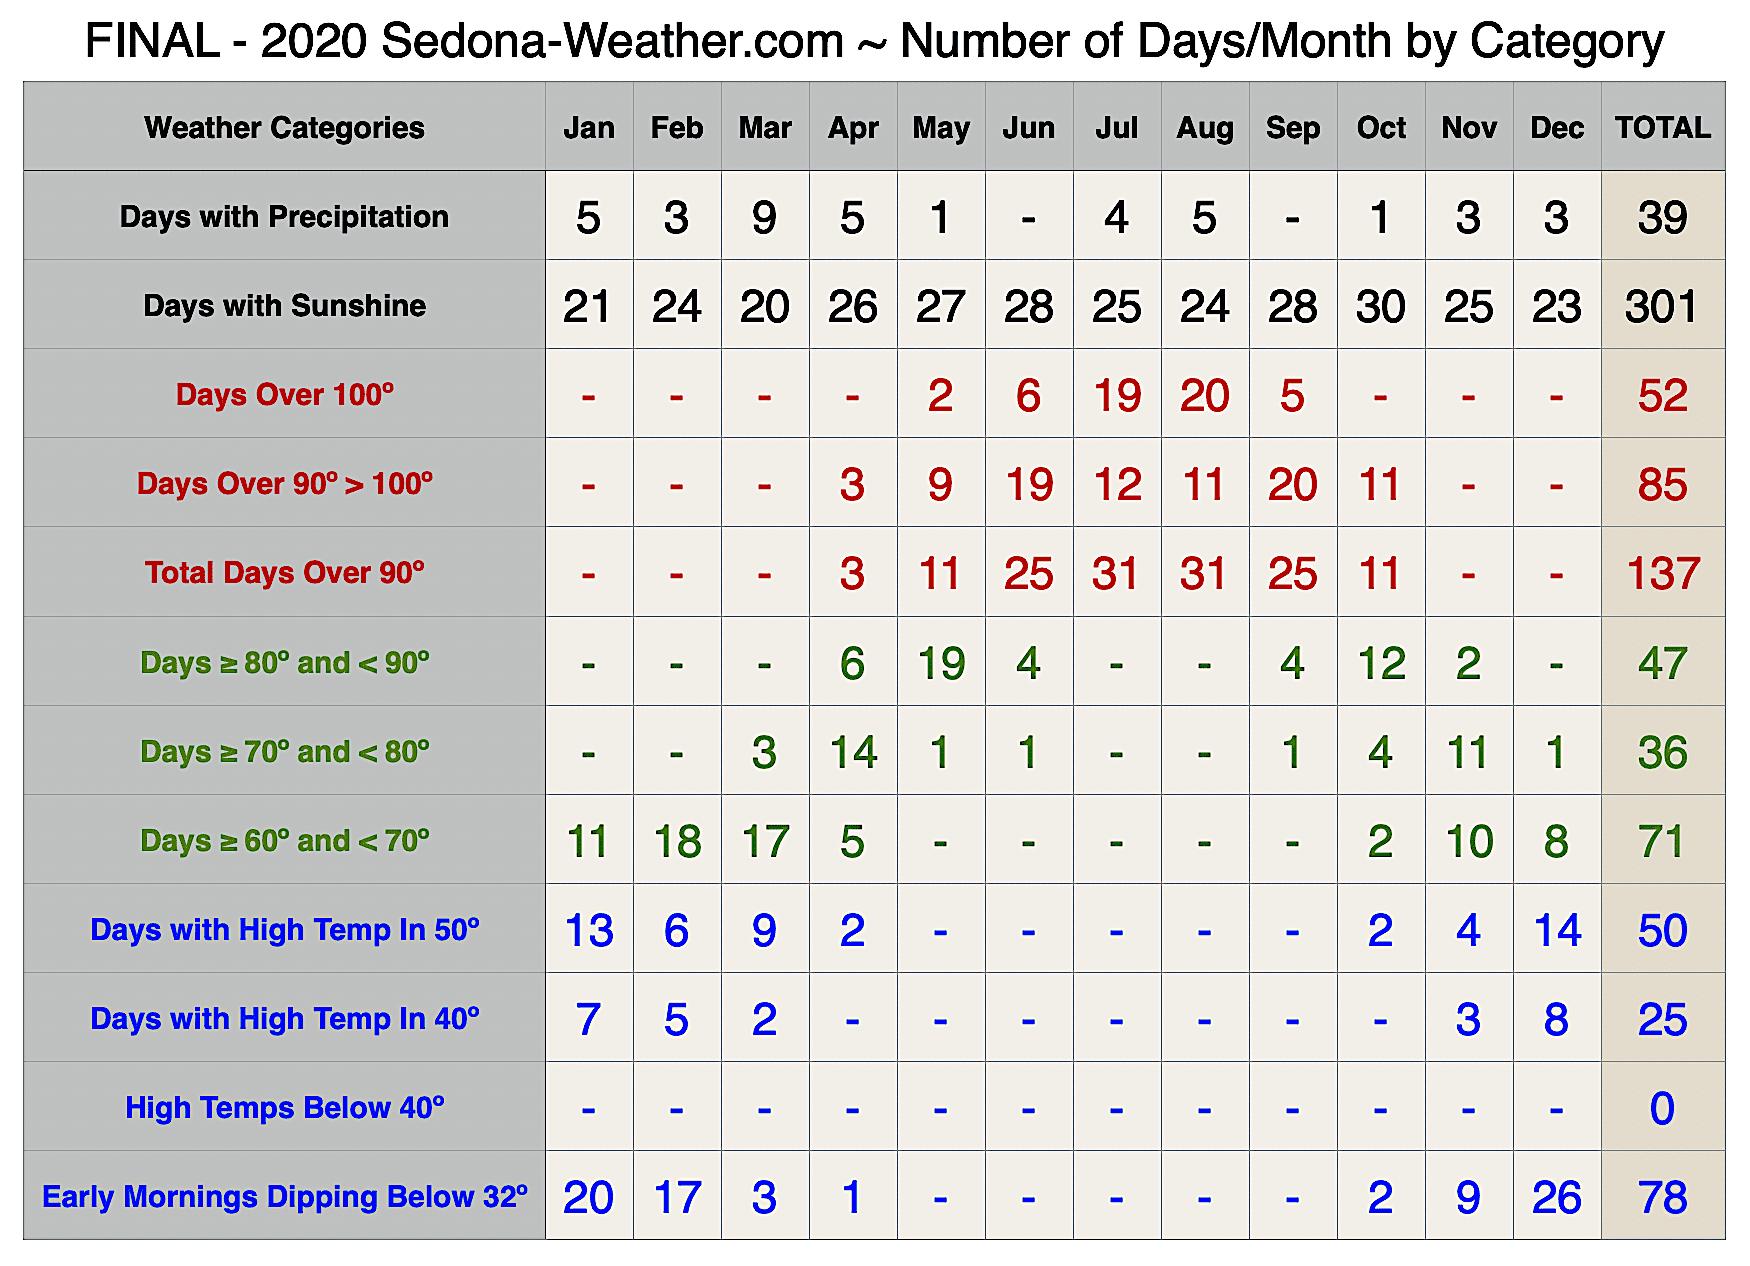 2020 Sedona Final Weather Category Summary